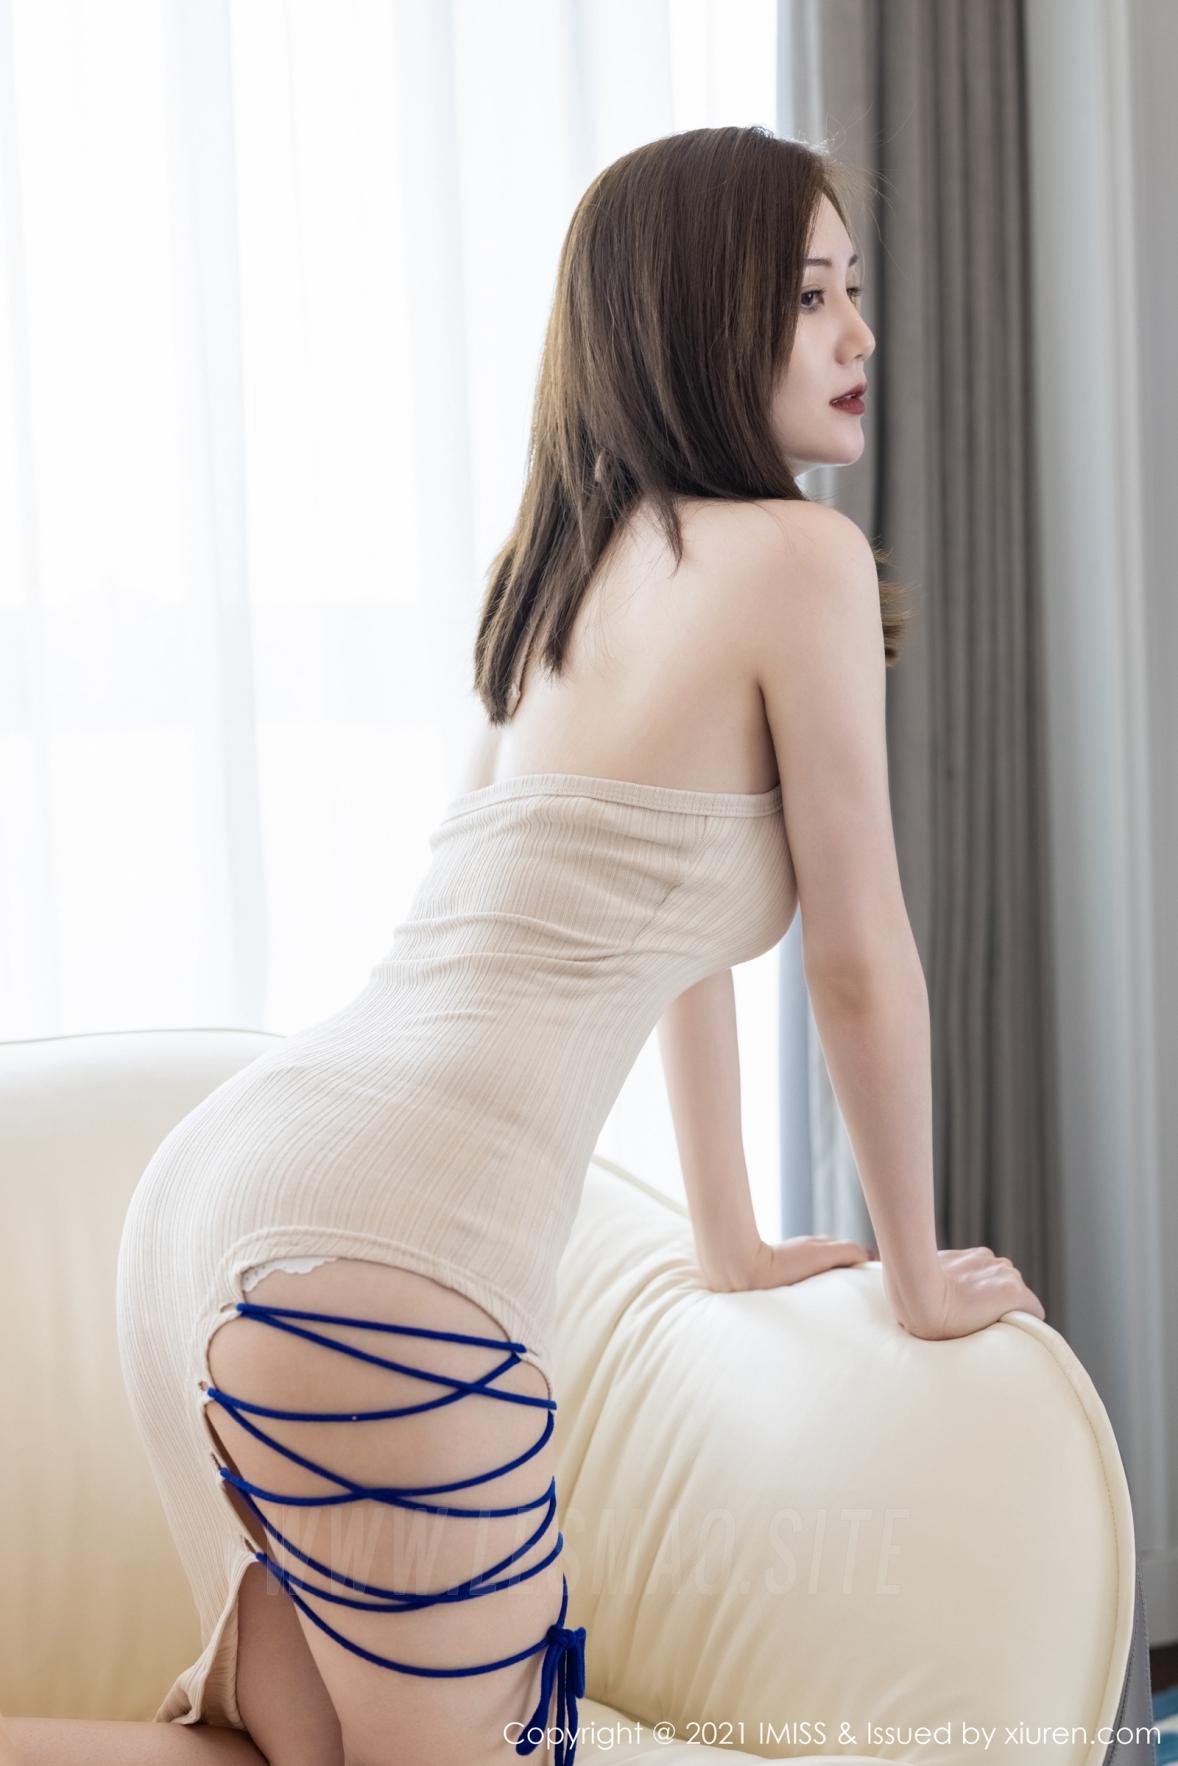 607 011 rsg 2689 4032 - IMiss 爱蜜社 Vol.607 米色吊裙 SISY思 性感写真3 - 爱蜜社 -【免费在线写真】【丽人丝语】